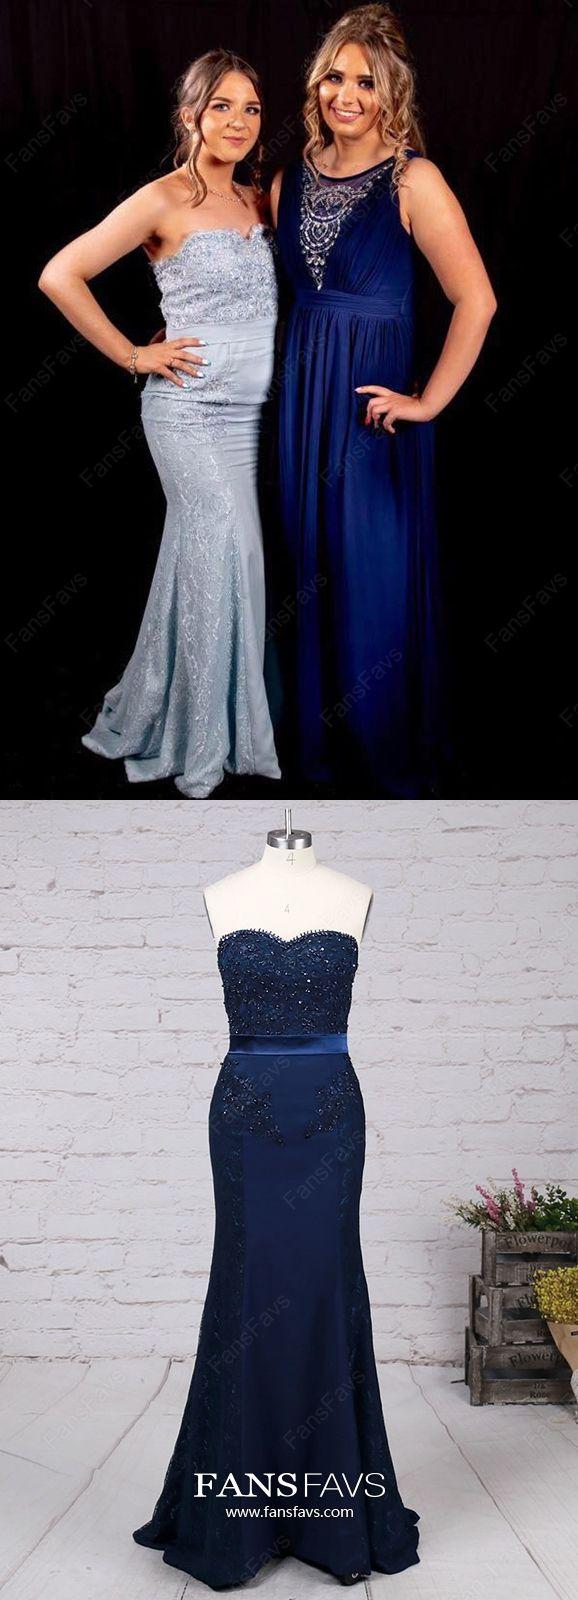 Long prom dresses sky blue mermaid prom dresses sweetheart lace